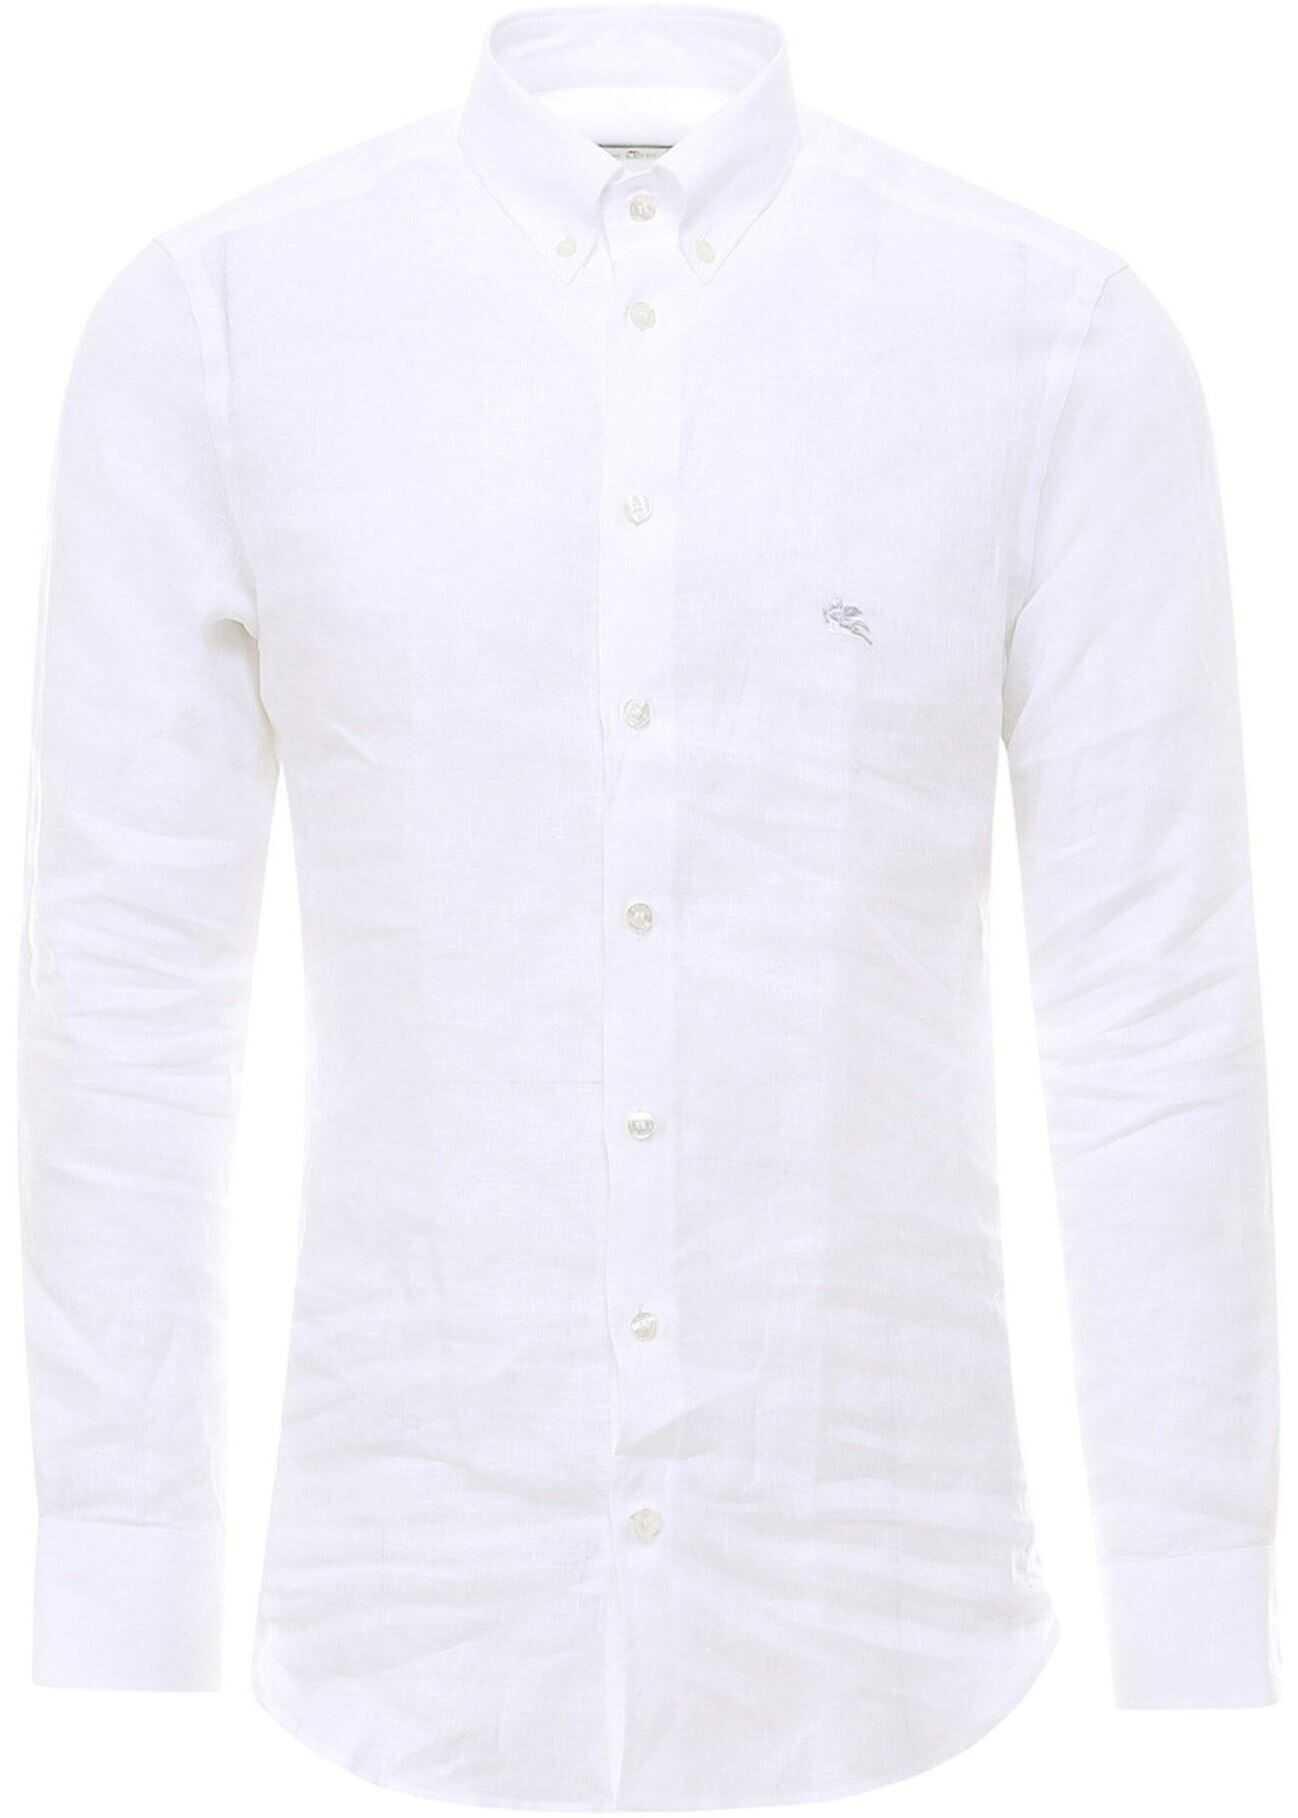 ETRO Linen Shirt In White White imagine